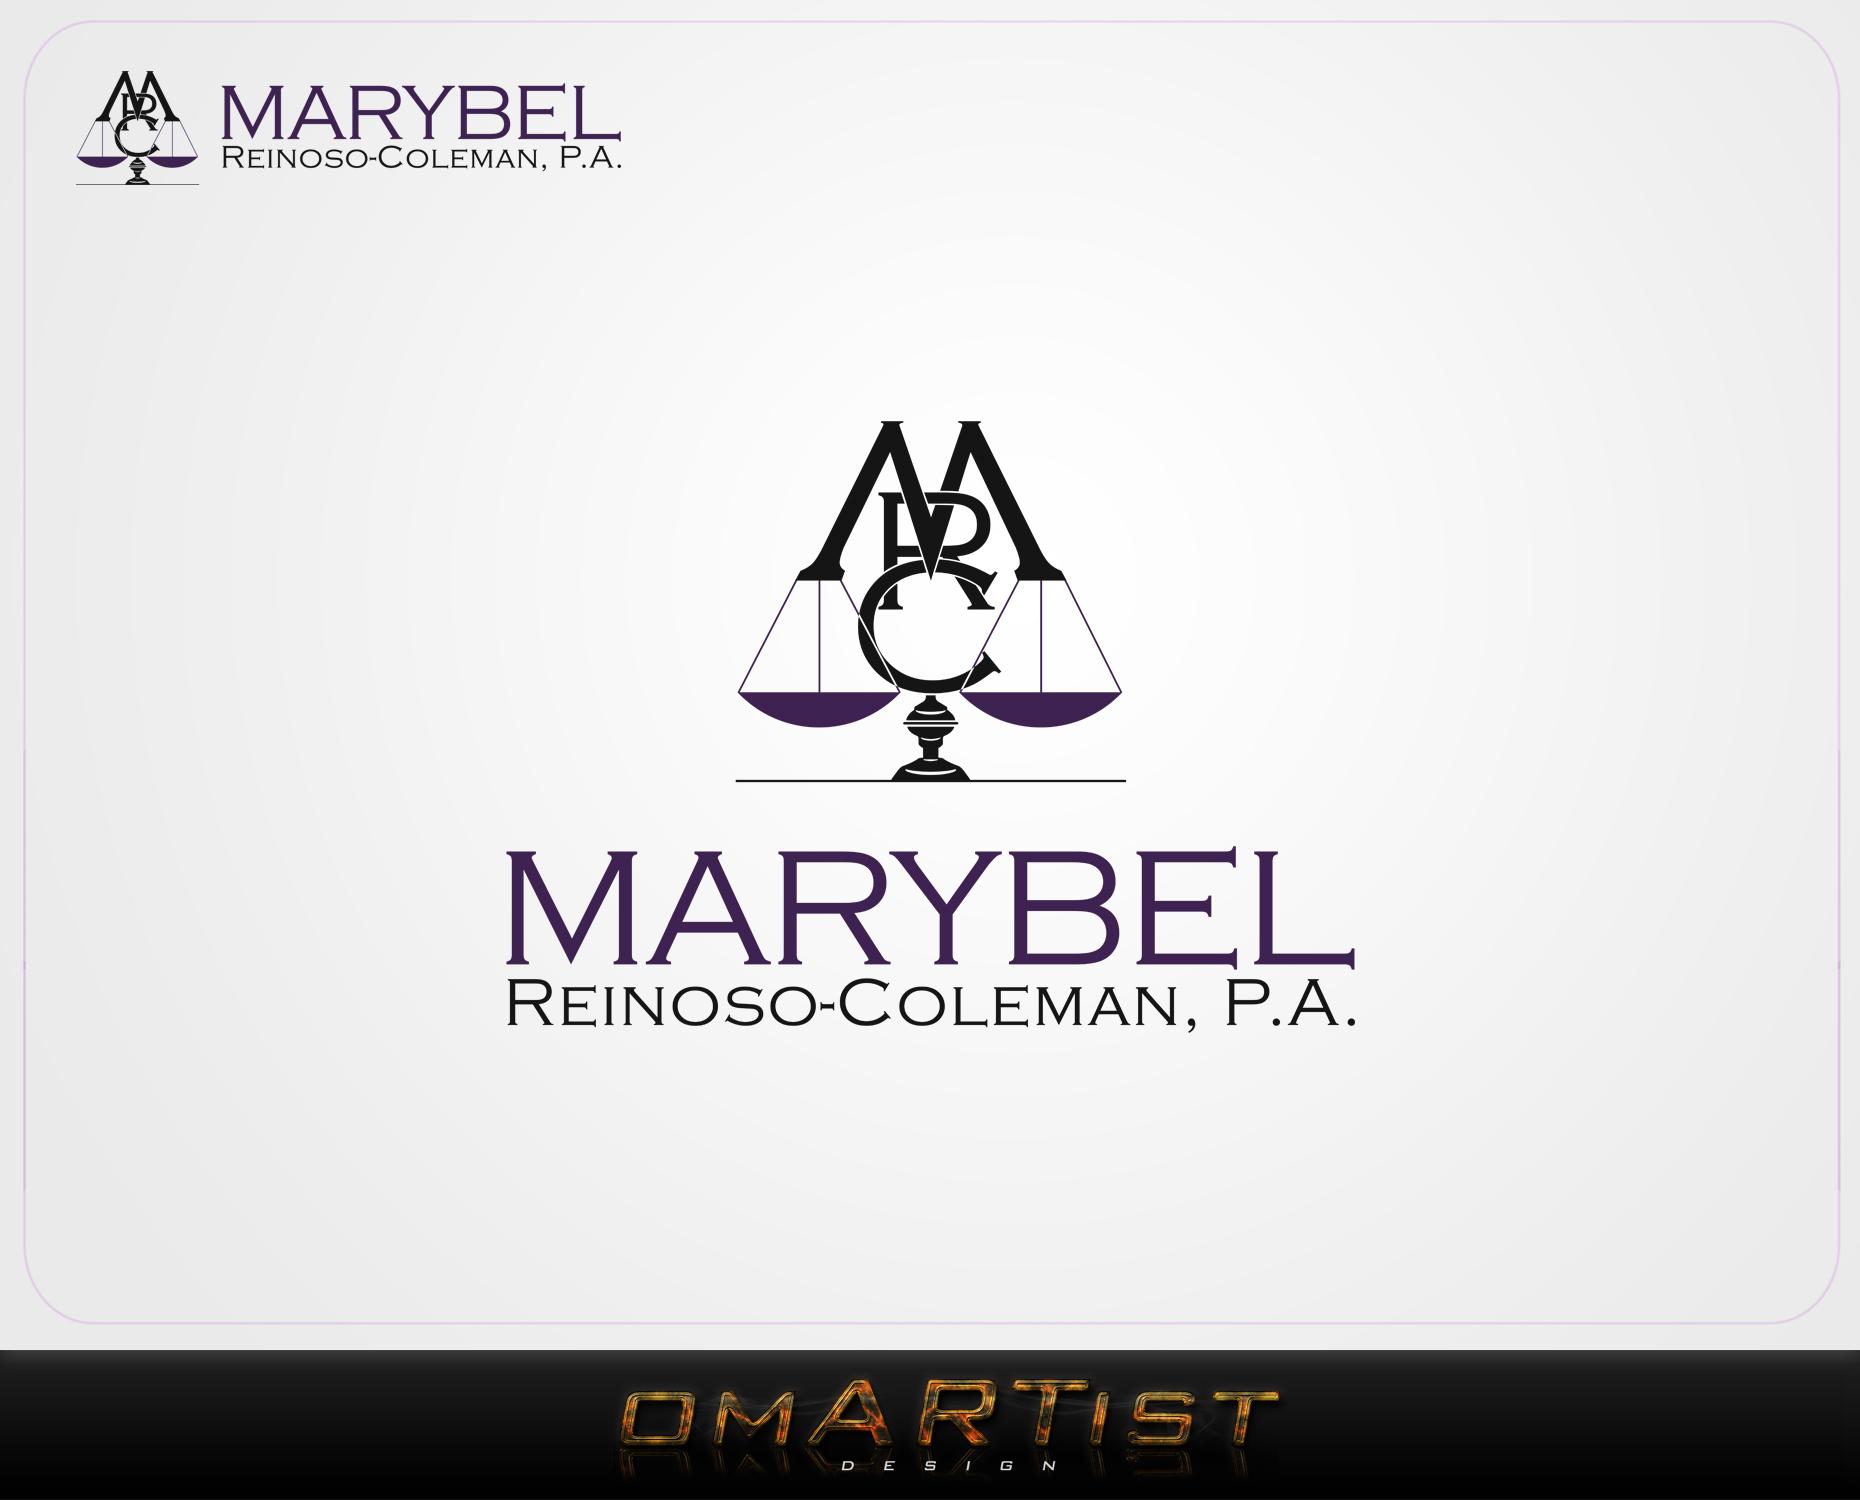 Logo Design by omARTist - Entry No. 15 in the Logo Design Contest Creative Logo Design for Marybel Reinoso Coleman P.A..